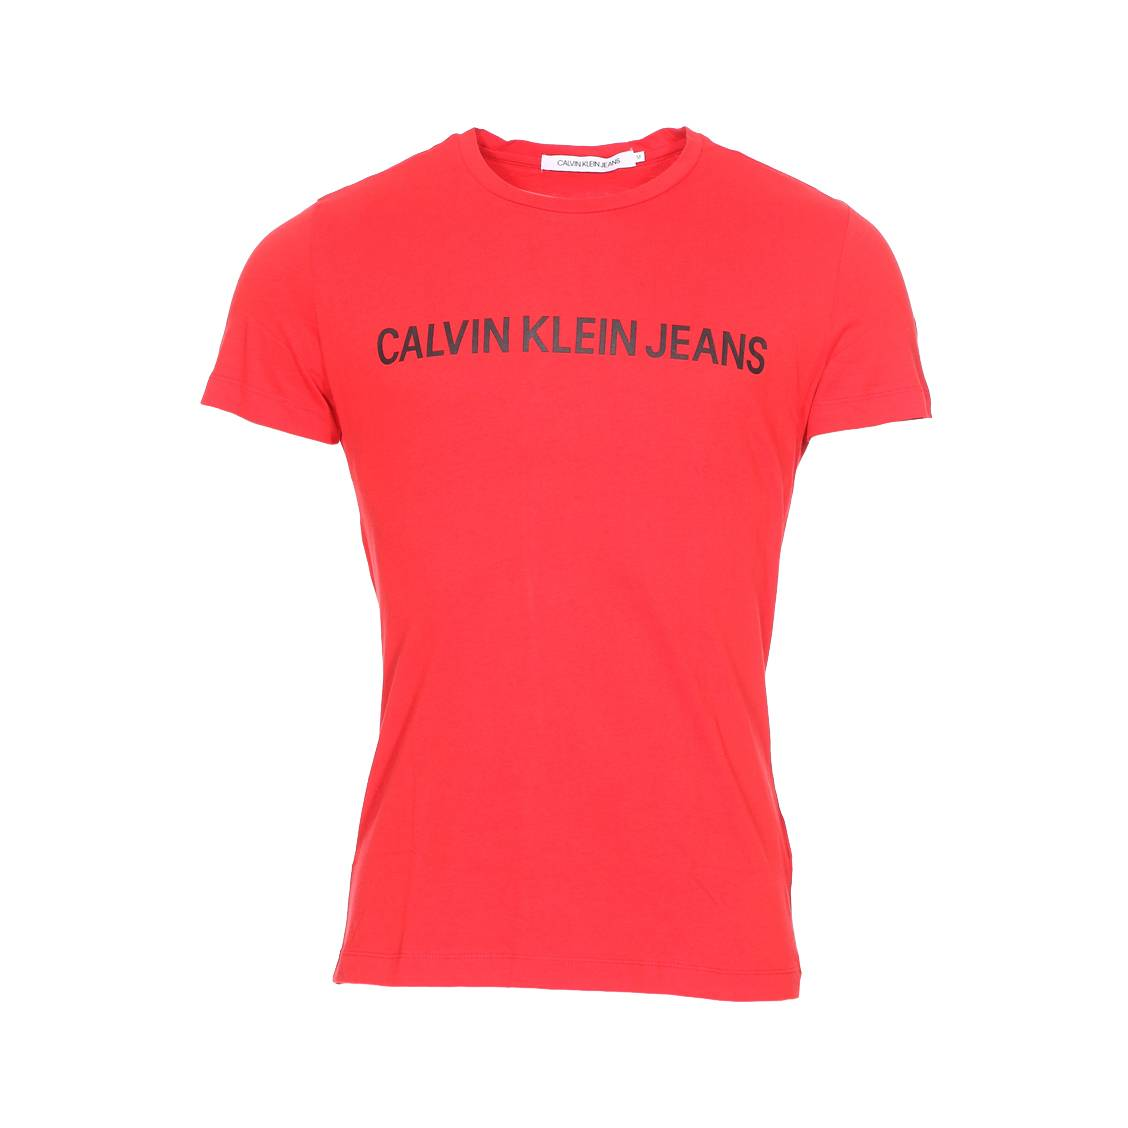 Tee-shirt col rond  institutional logo slim en coton rouge floqué